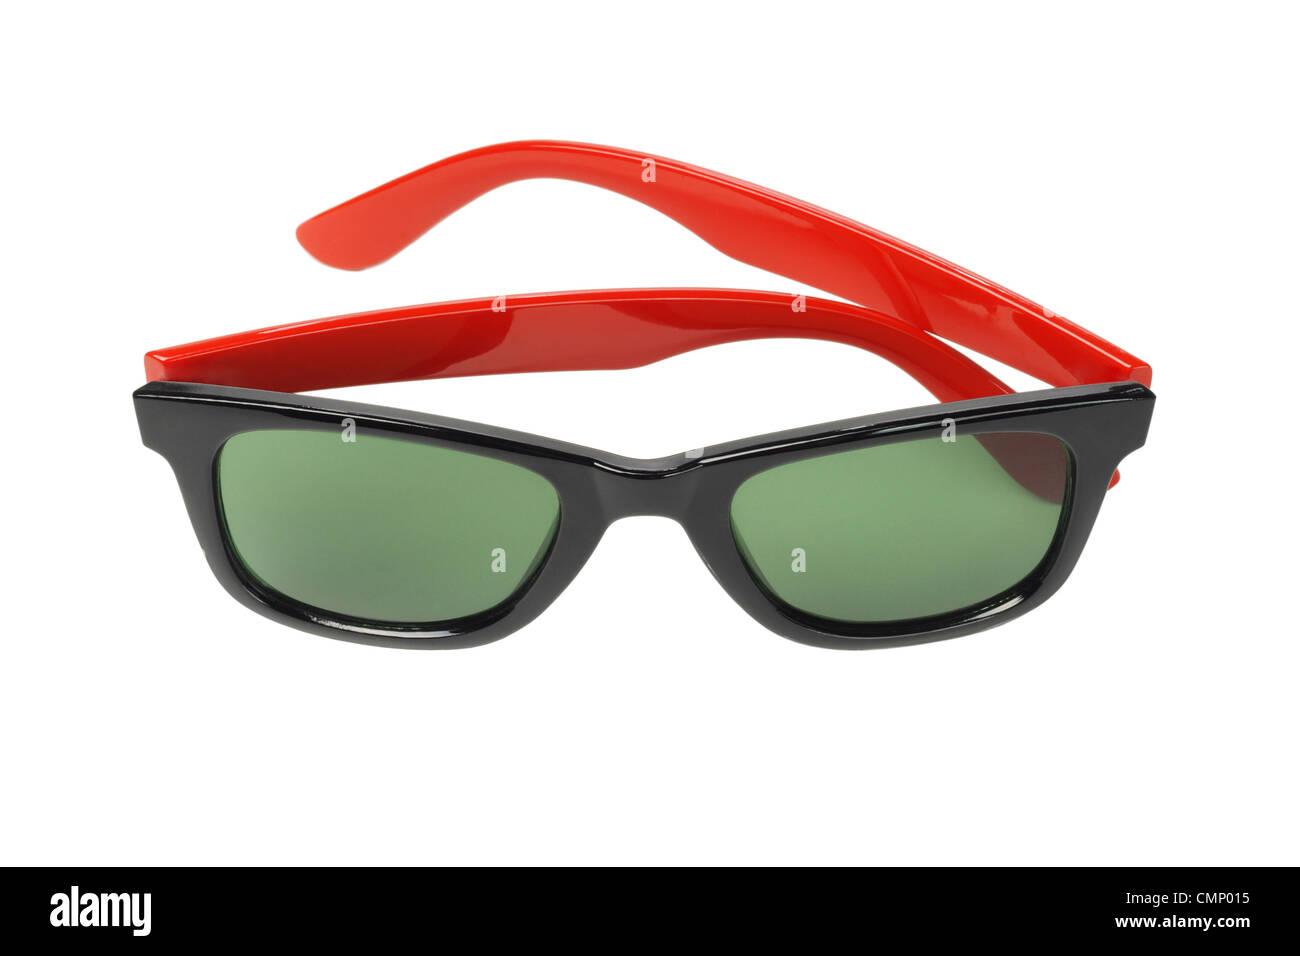 Pair of Fashionable Sunglasses on White Background - Stock Image